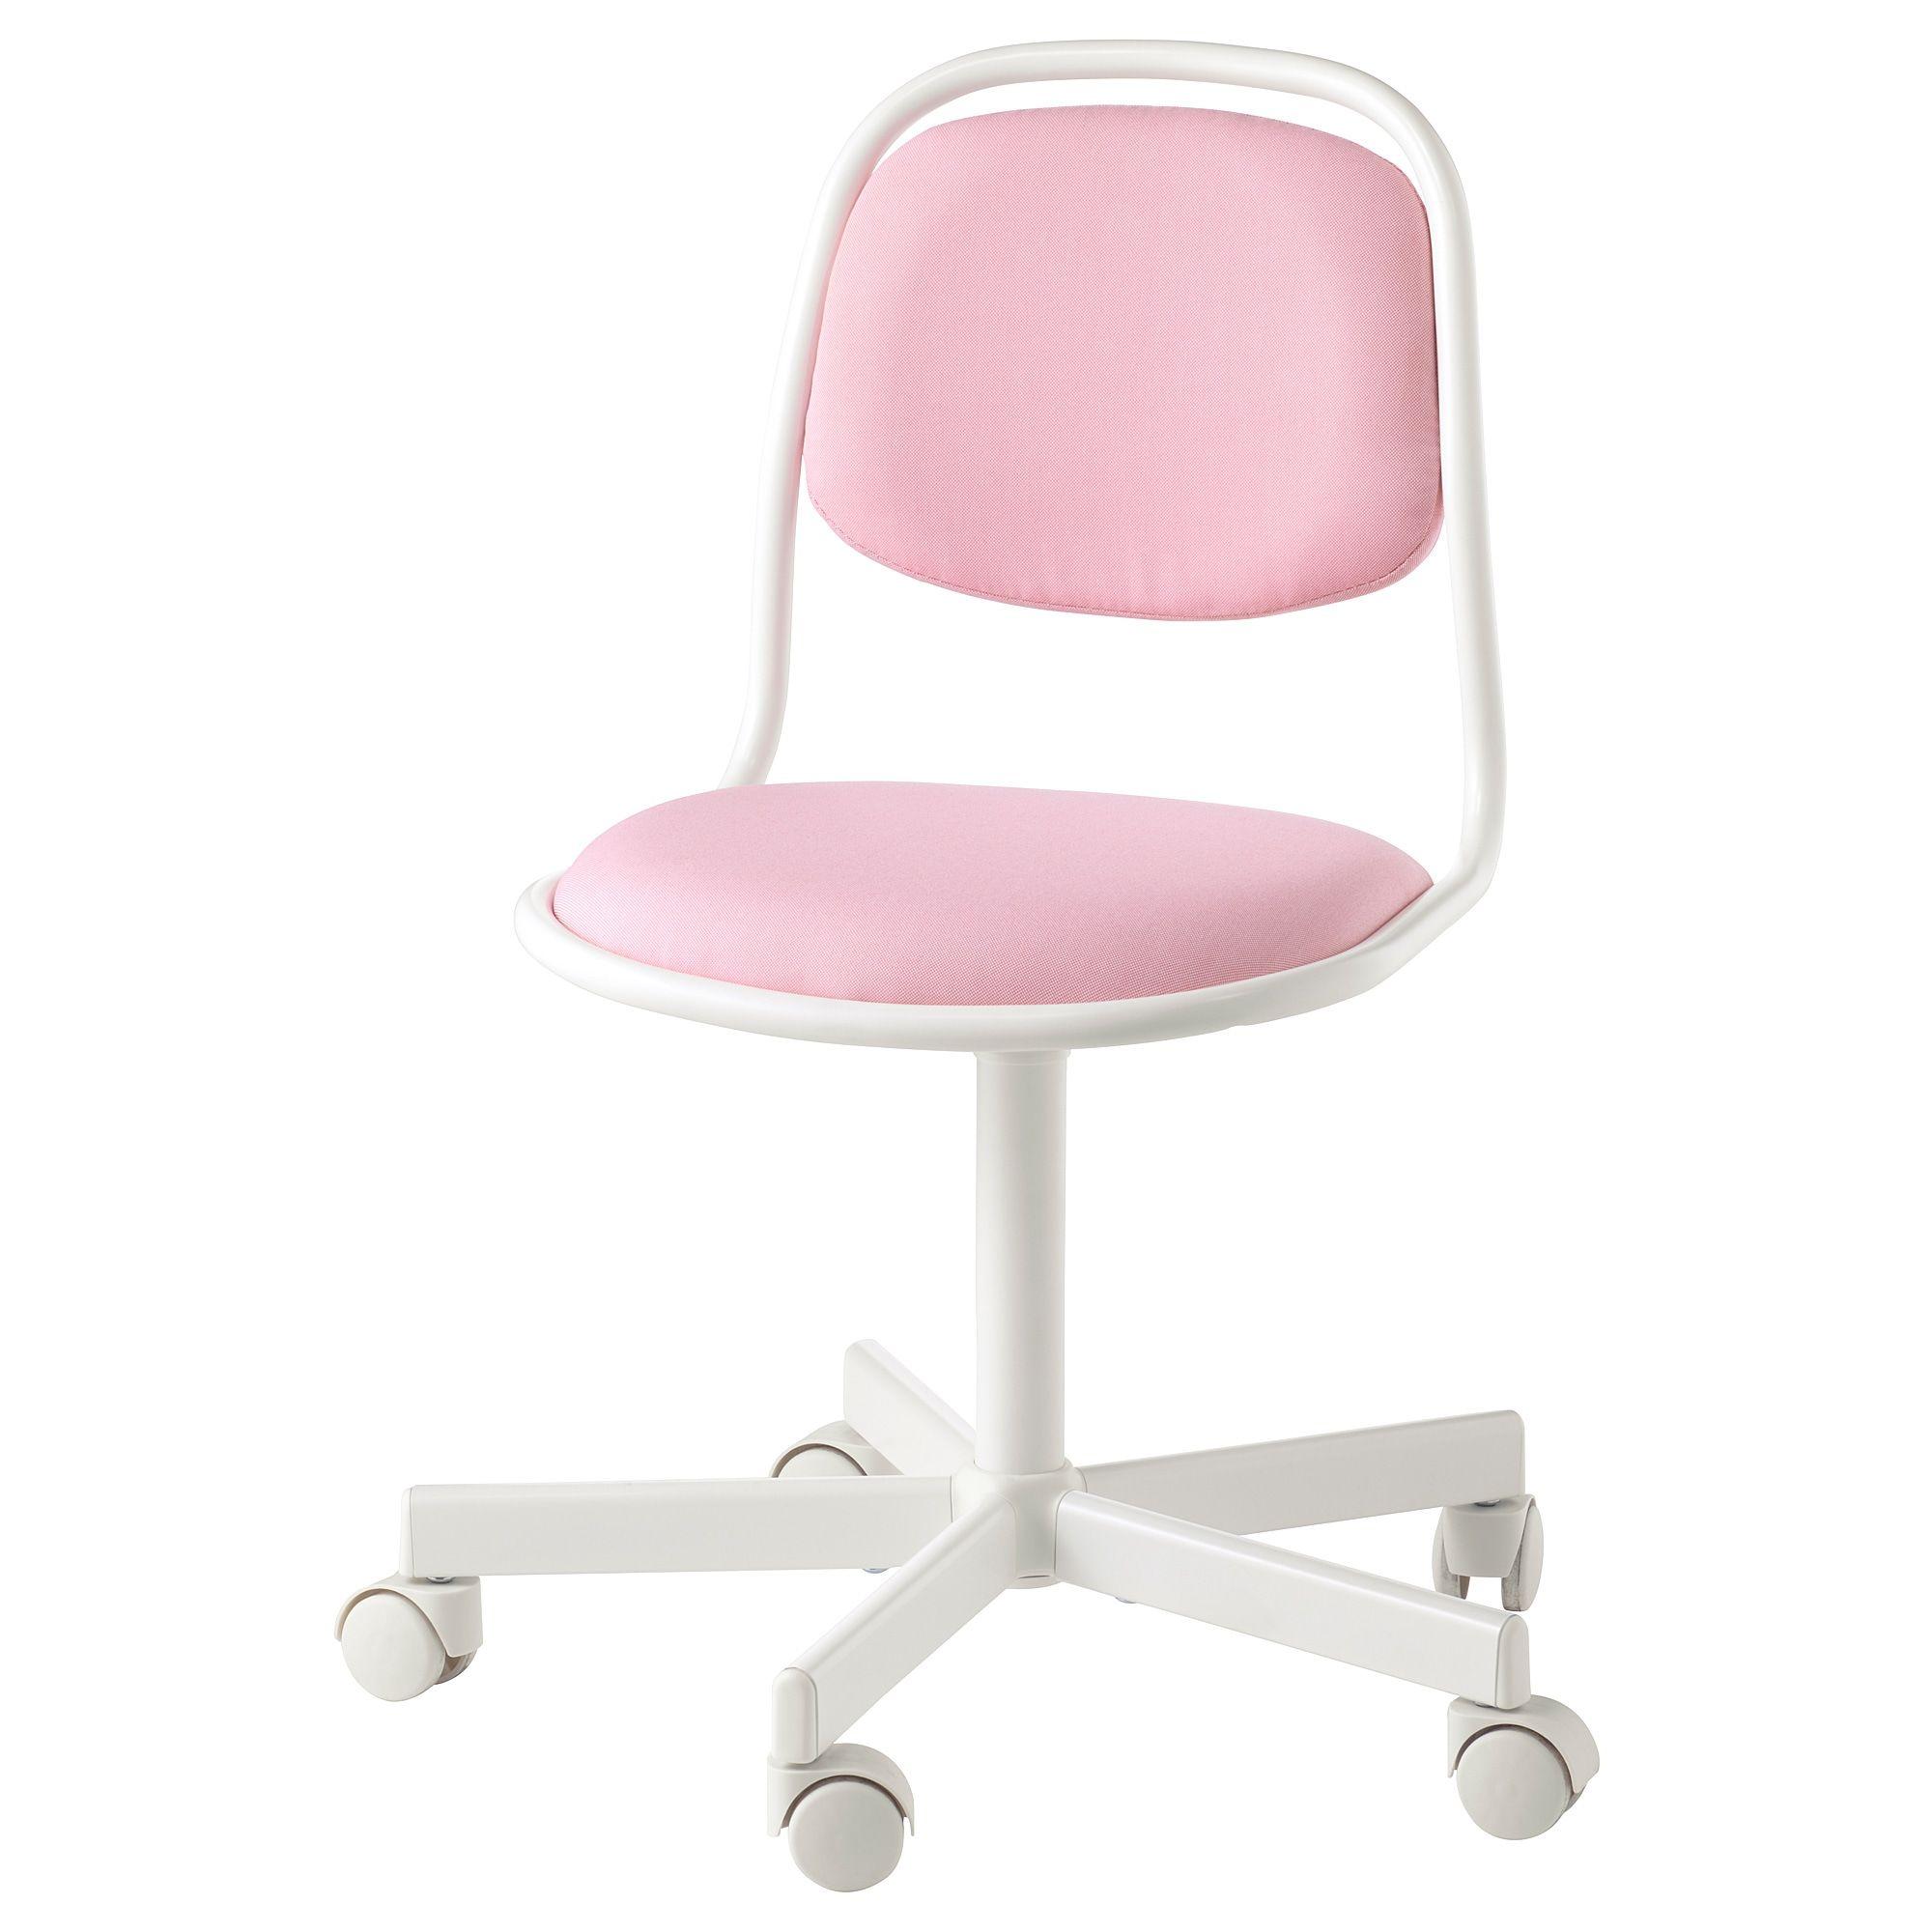 ÖRFJÄLL Child's desk chair white, Vissle pink